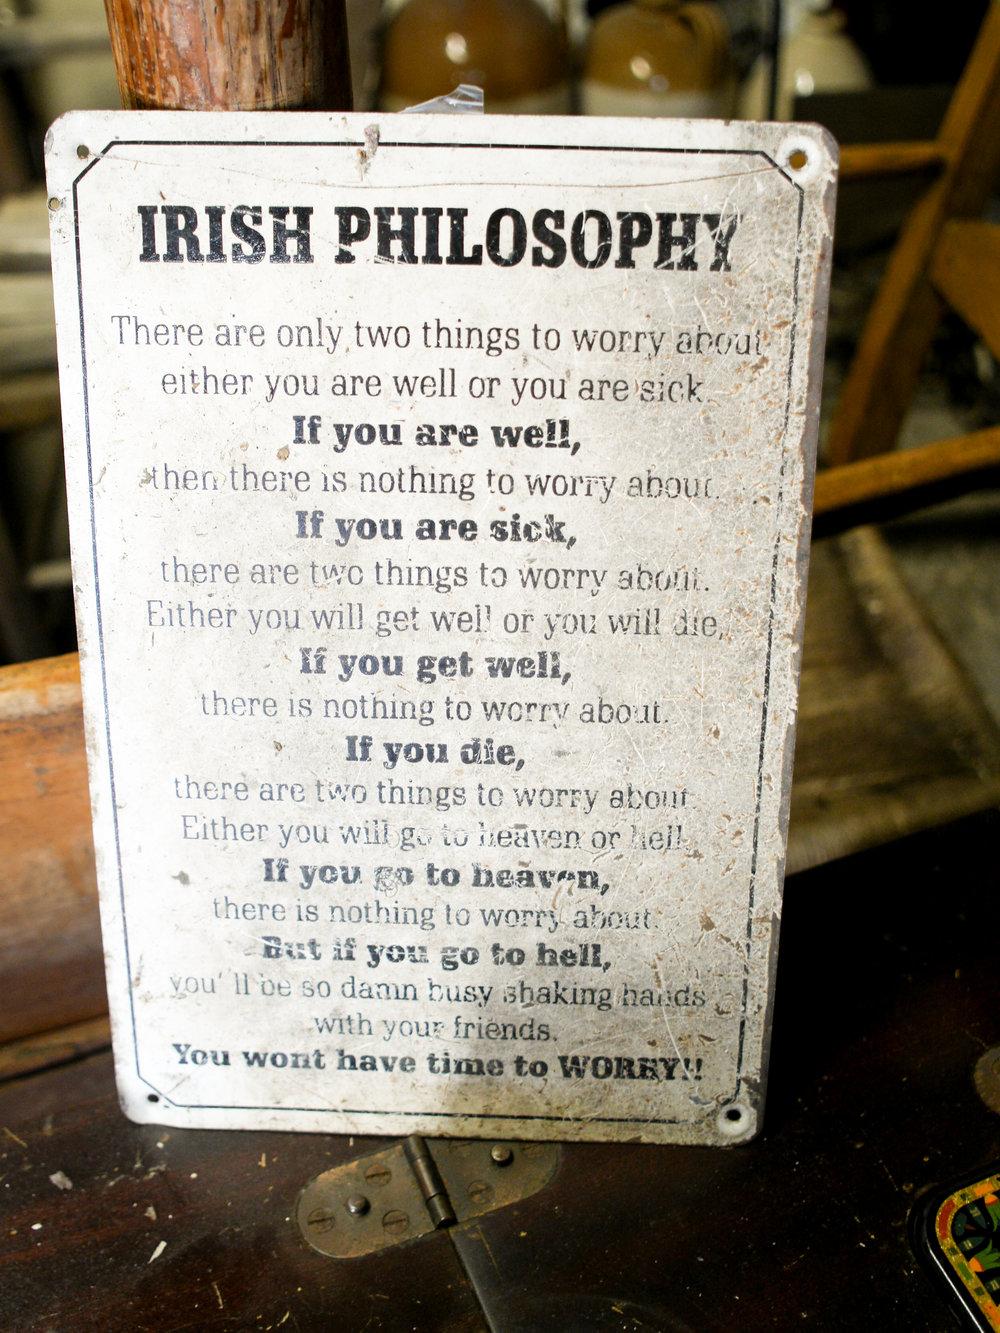 Irish philosophy at Johnnie Fox's Museum at Johnnie Fox's Pub